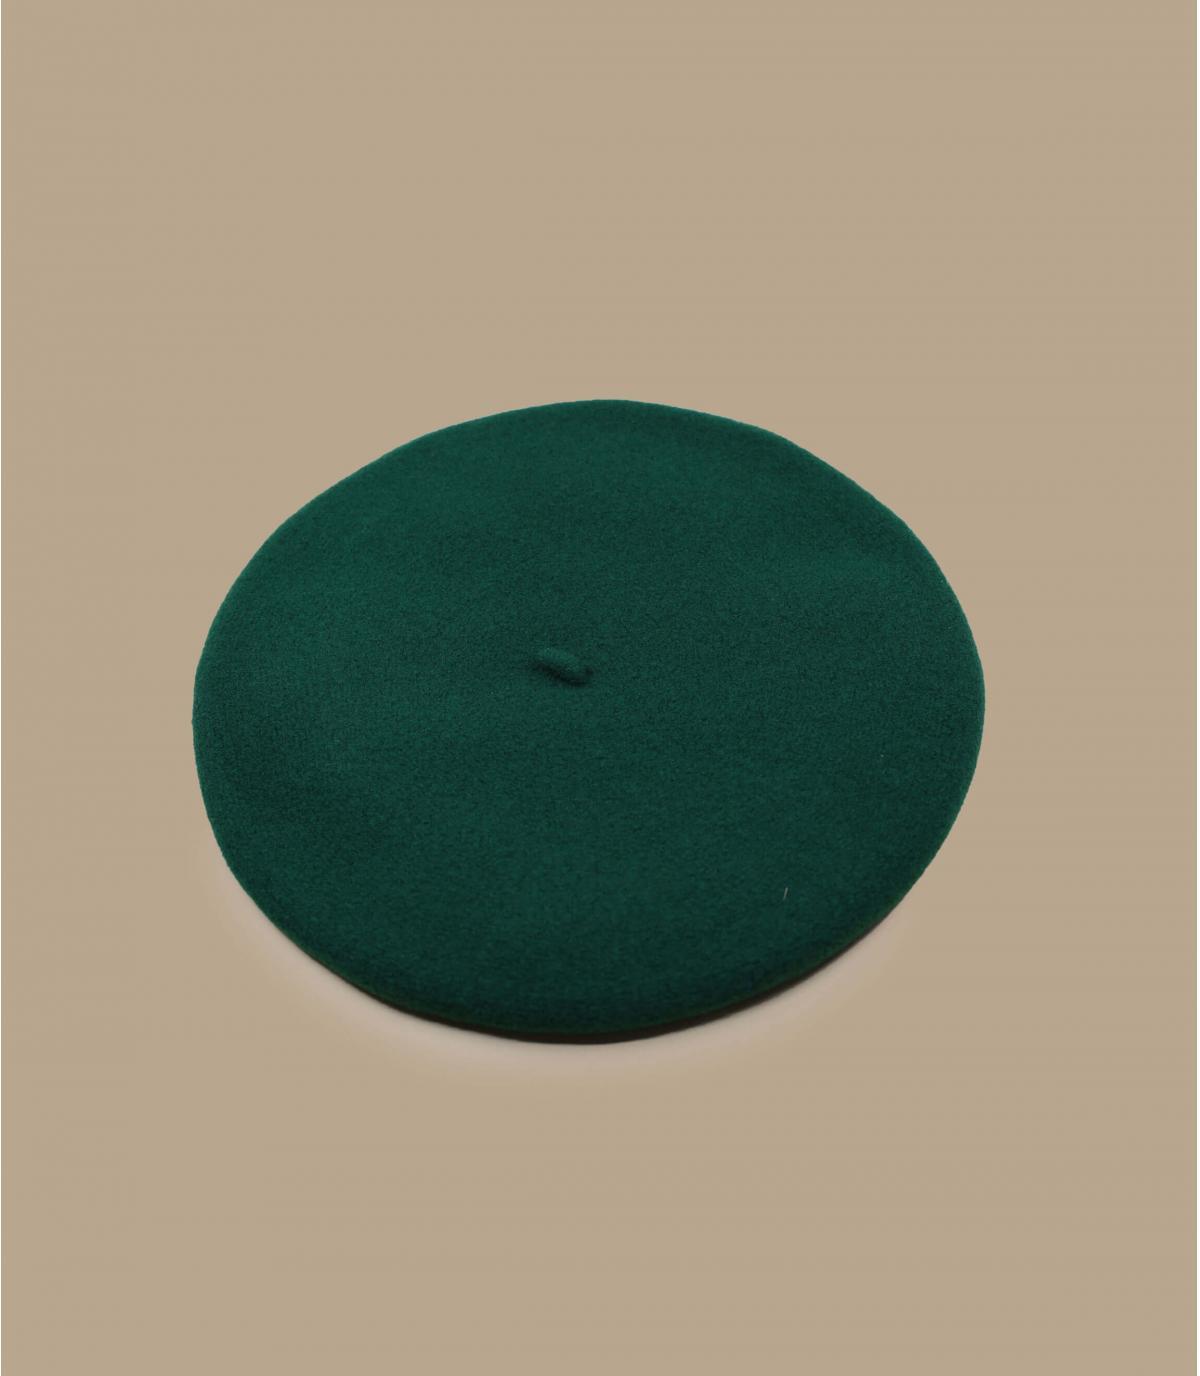 béret Laulhère vert mérinos